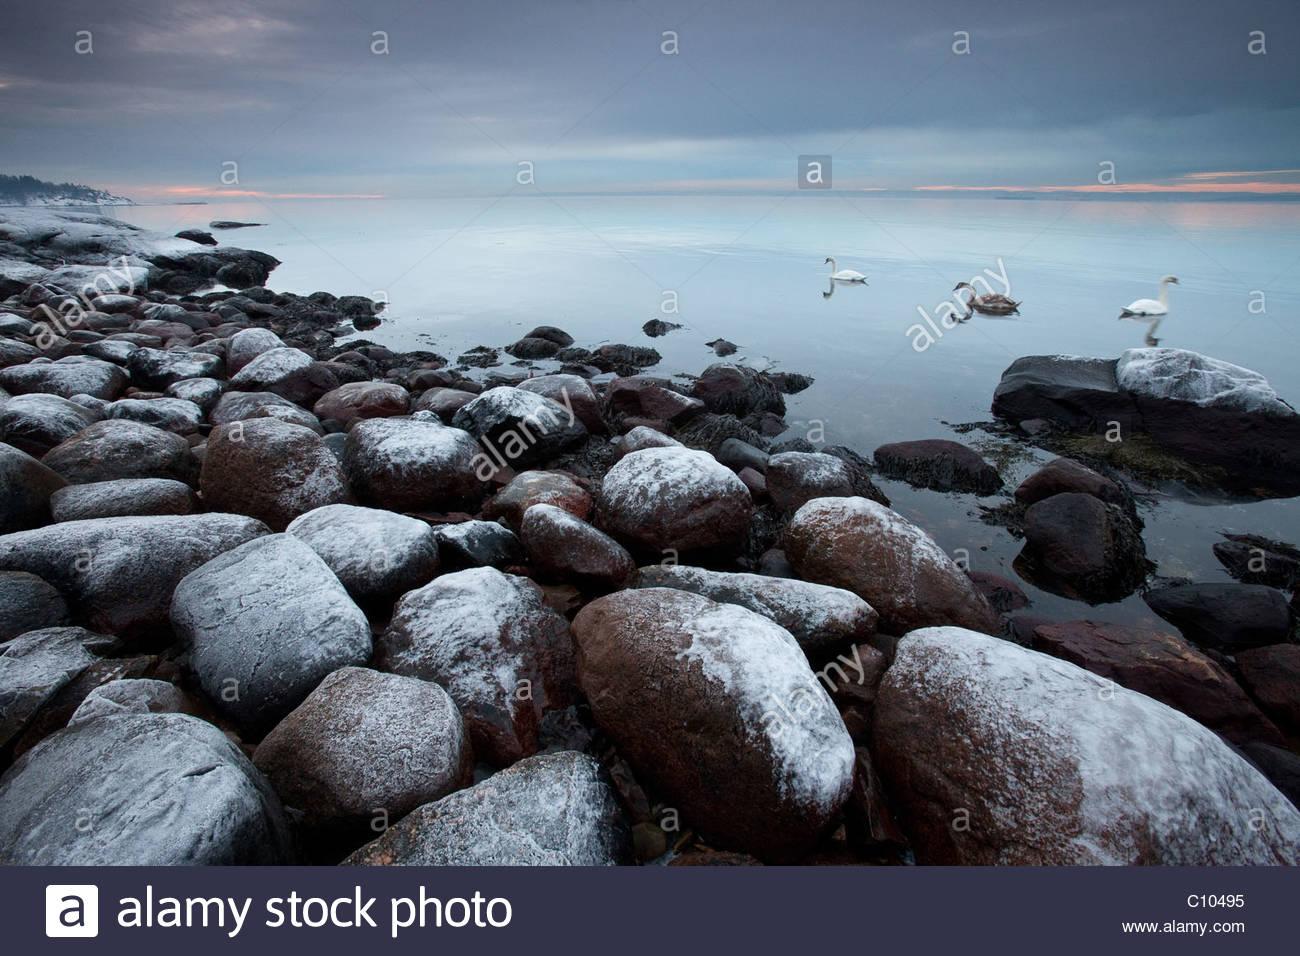 Paisaje invernal y costera Cisne familia Larkollen en Rygge kommune, Østfold fylke, sureste de Noruega. Imagen De Stock